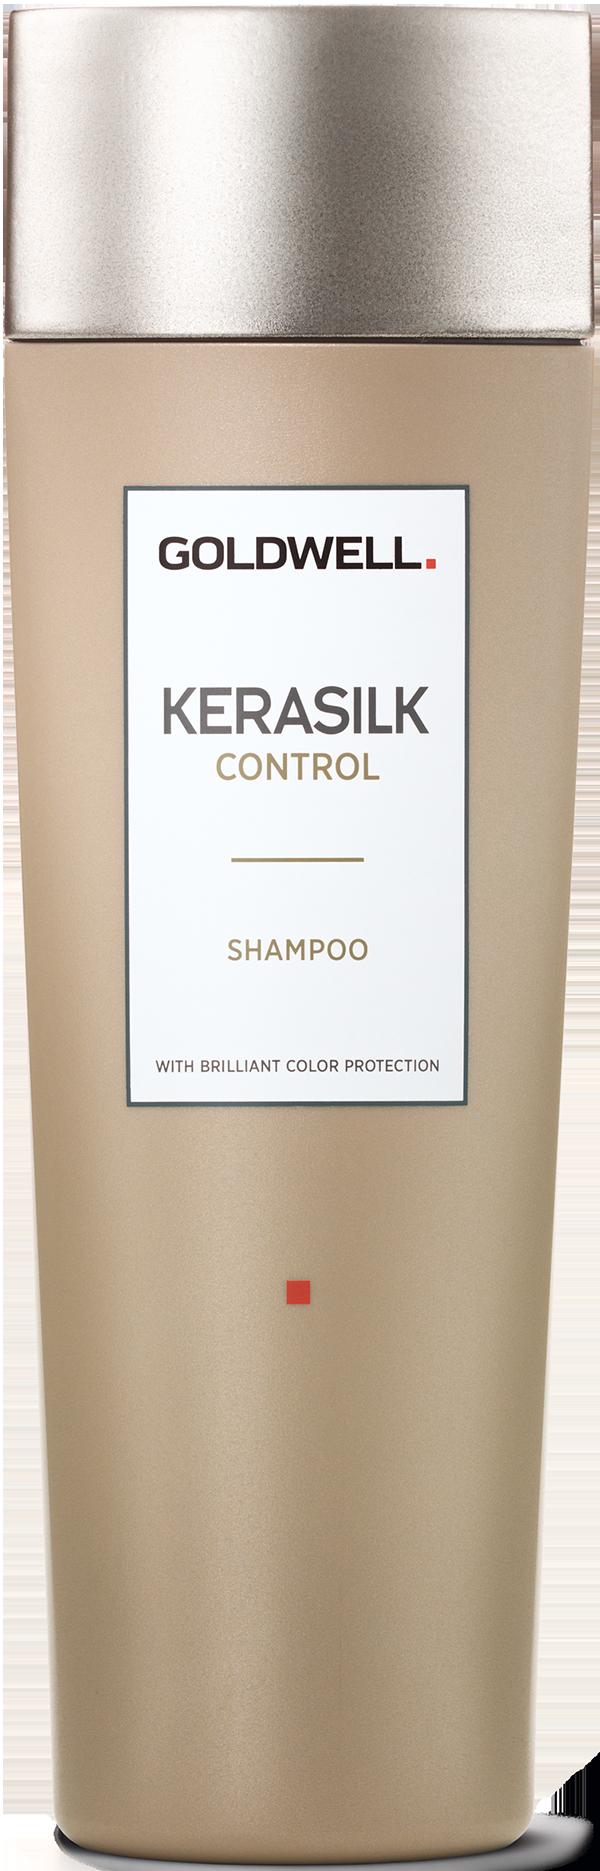 FTG Produkte | Kerasilk Control